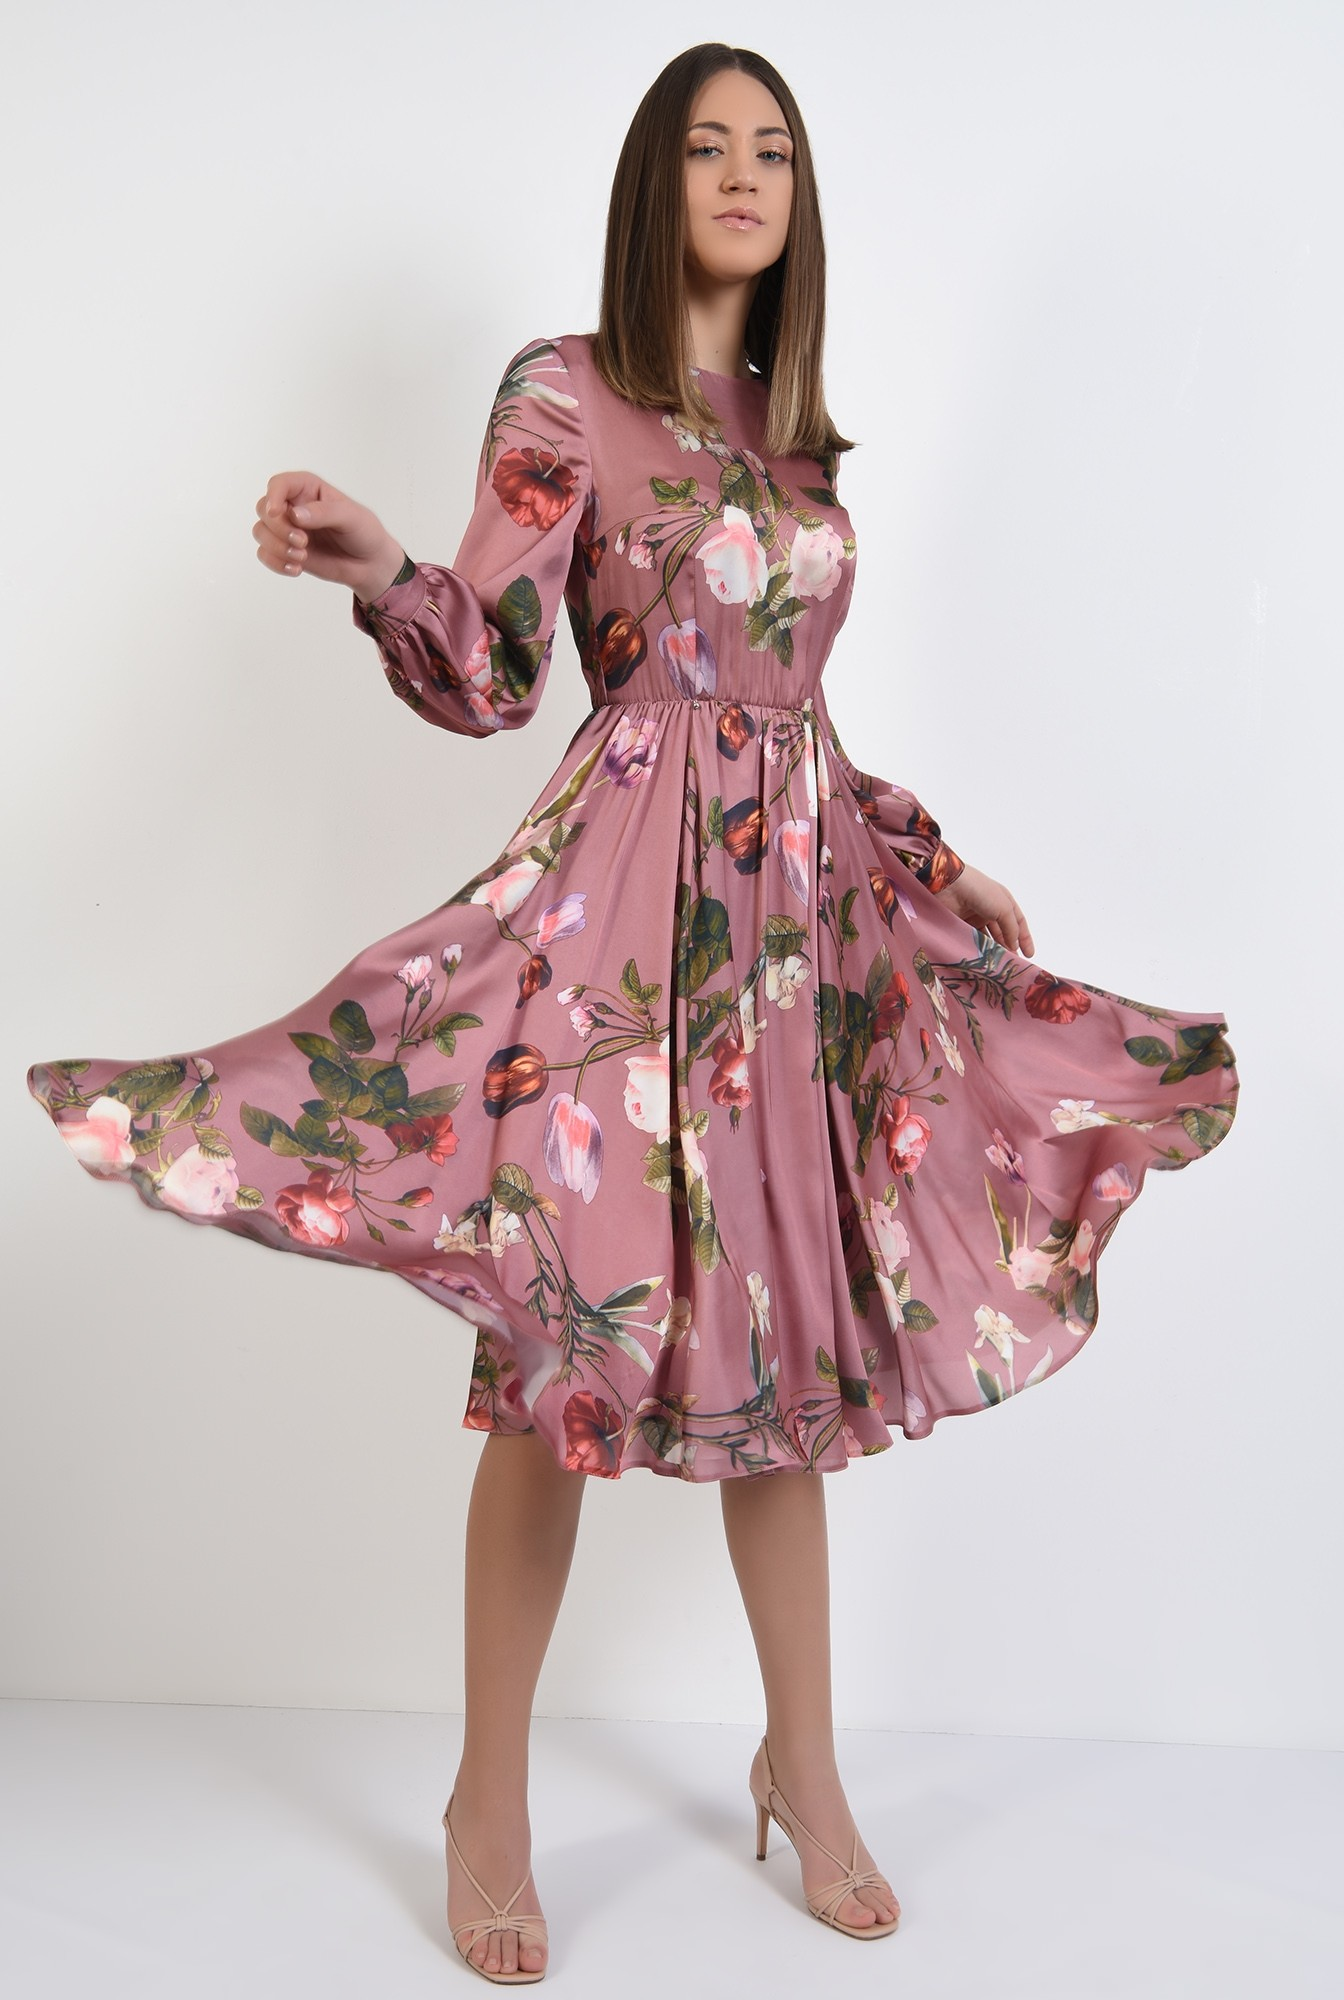 360 - rochie de primavara, clos, cu imprimeu floral, evazata, maneci lungi bufante